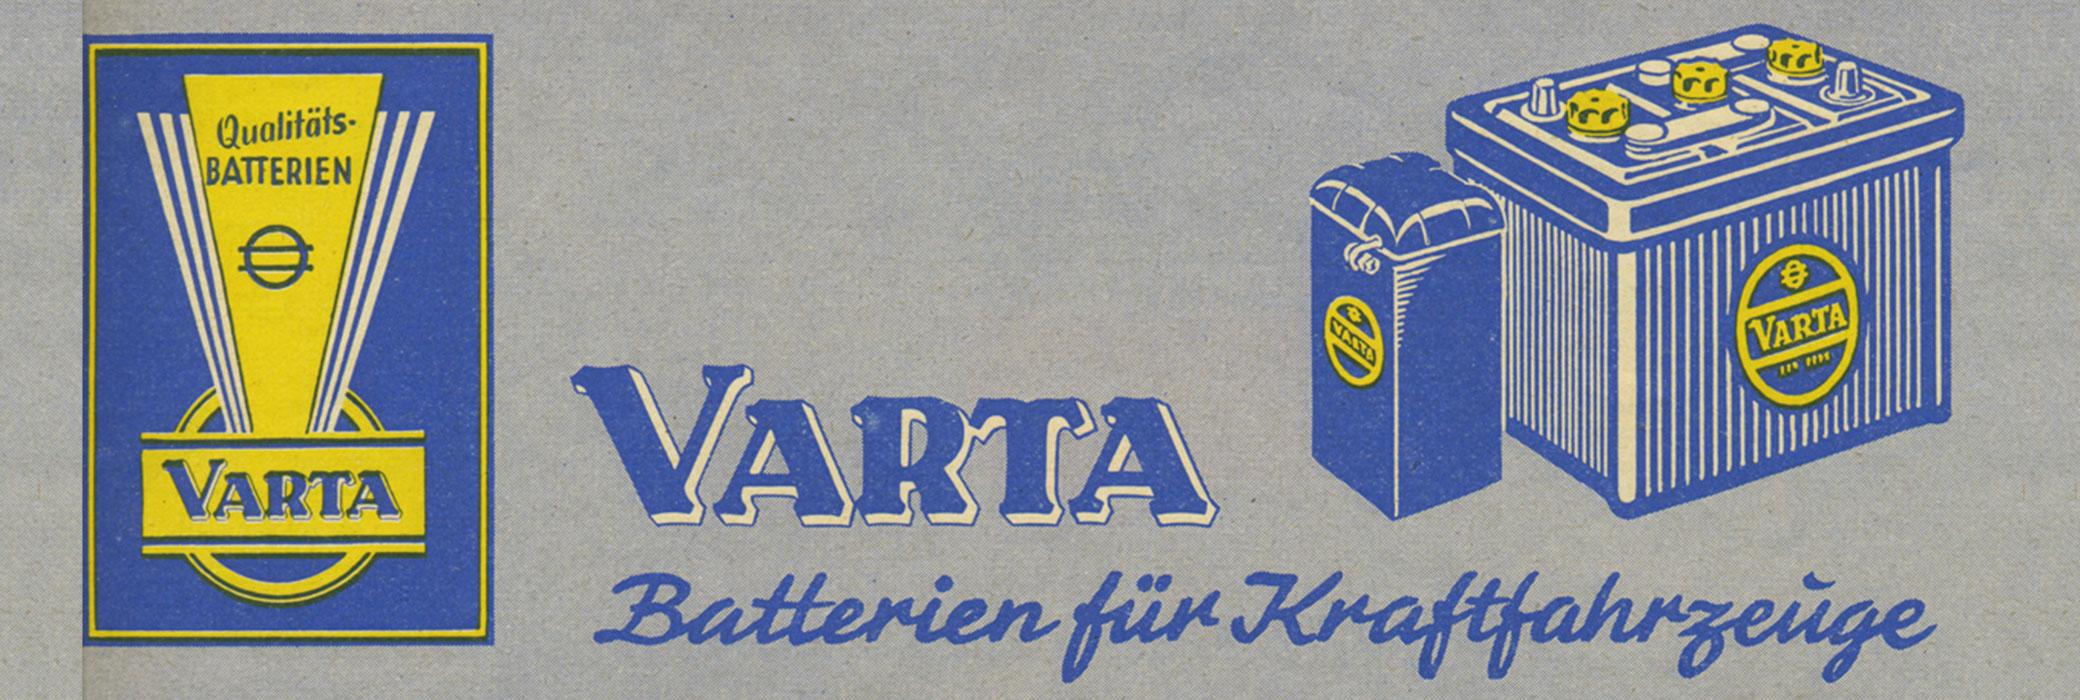 Dawna reklama akumulatora VARTA® wkolorze żółtym iniebieskim